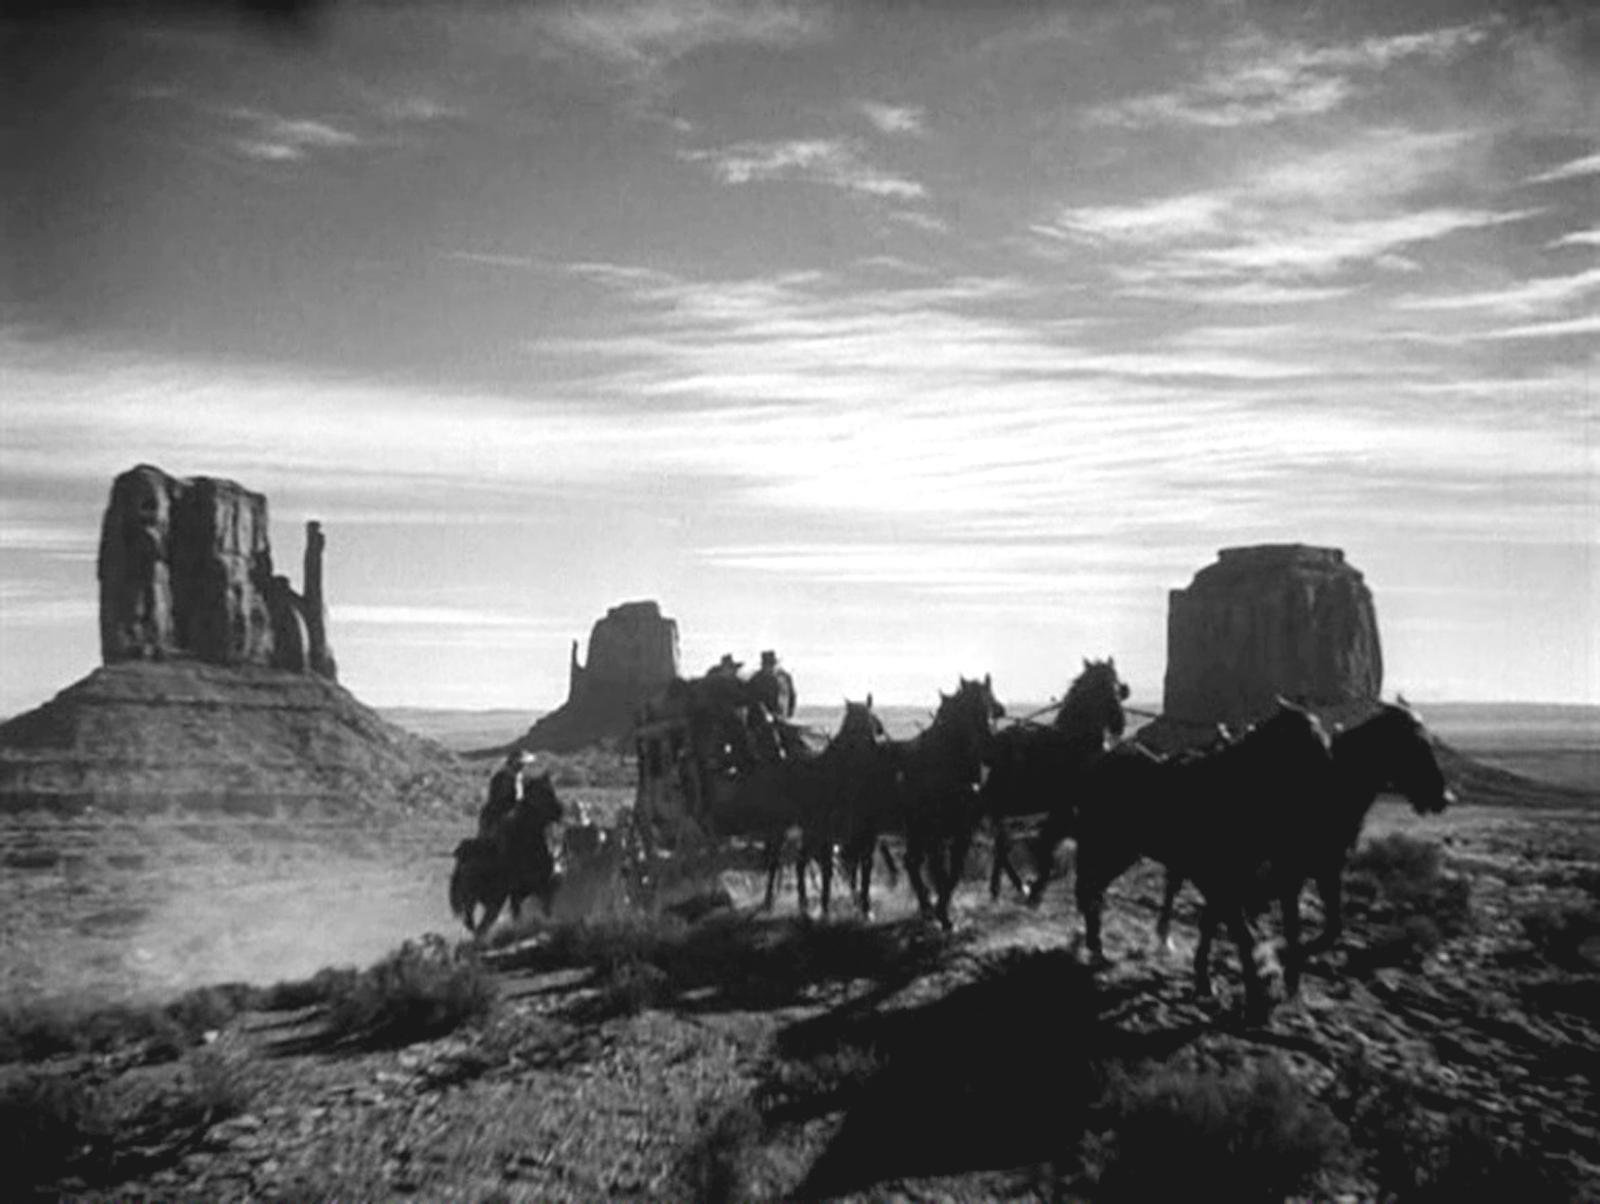 Stagecoach06